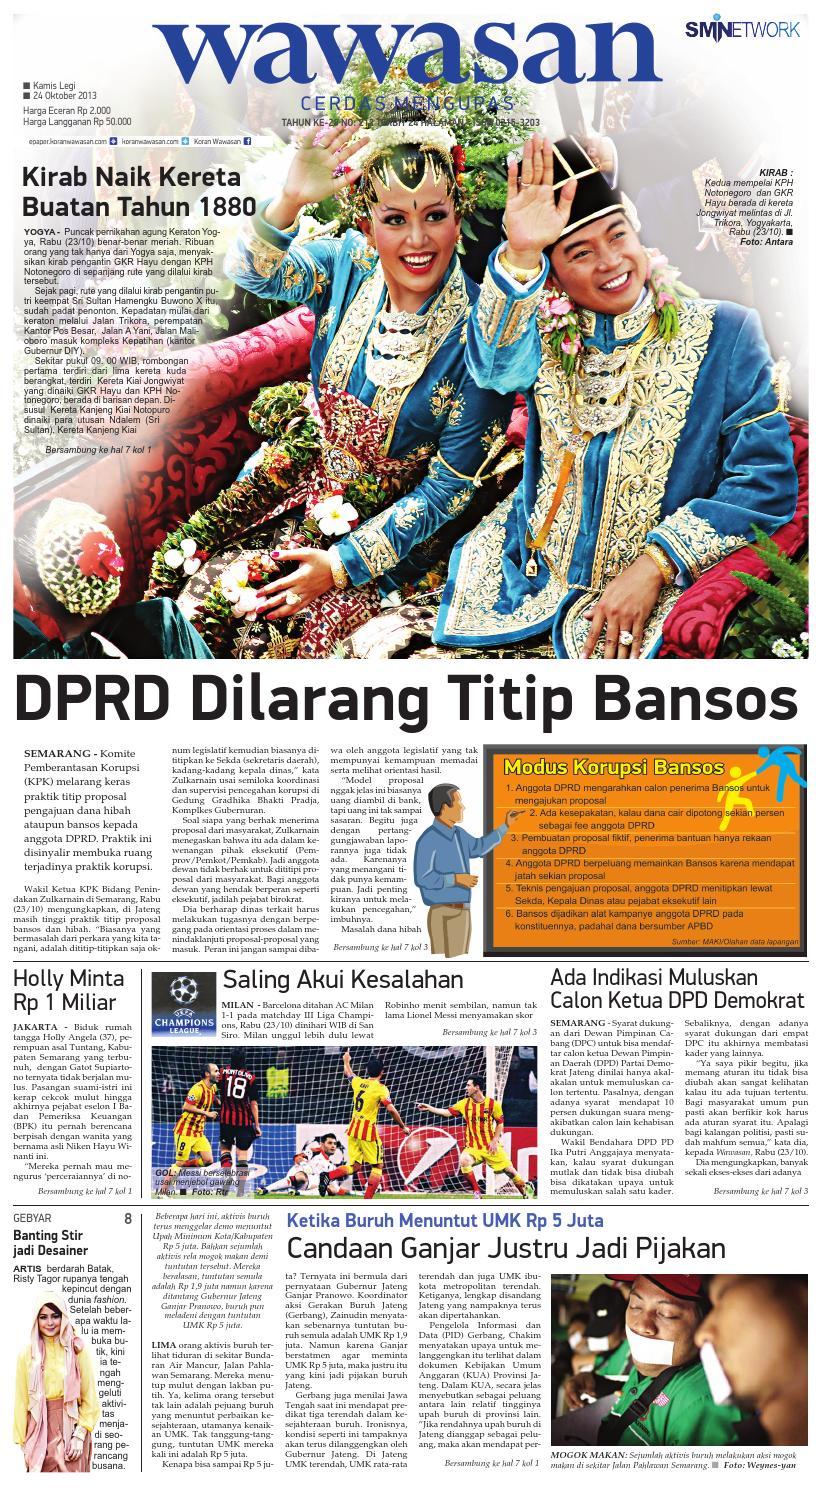 WAWASAN 24 Oktober 2013 by KORAN PAGI WAWASAN - issuu 37842ca2a6